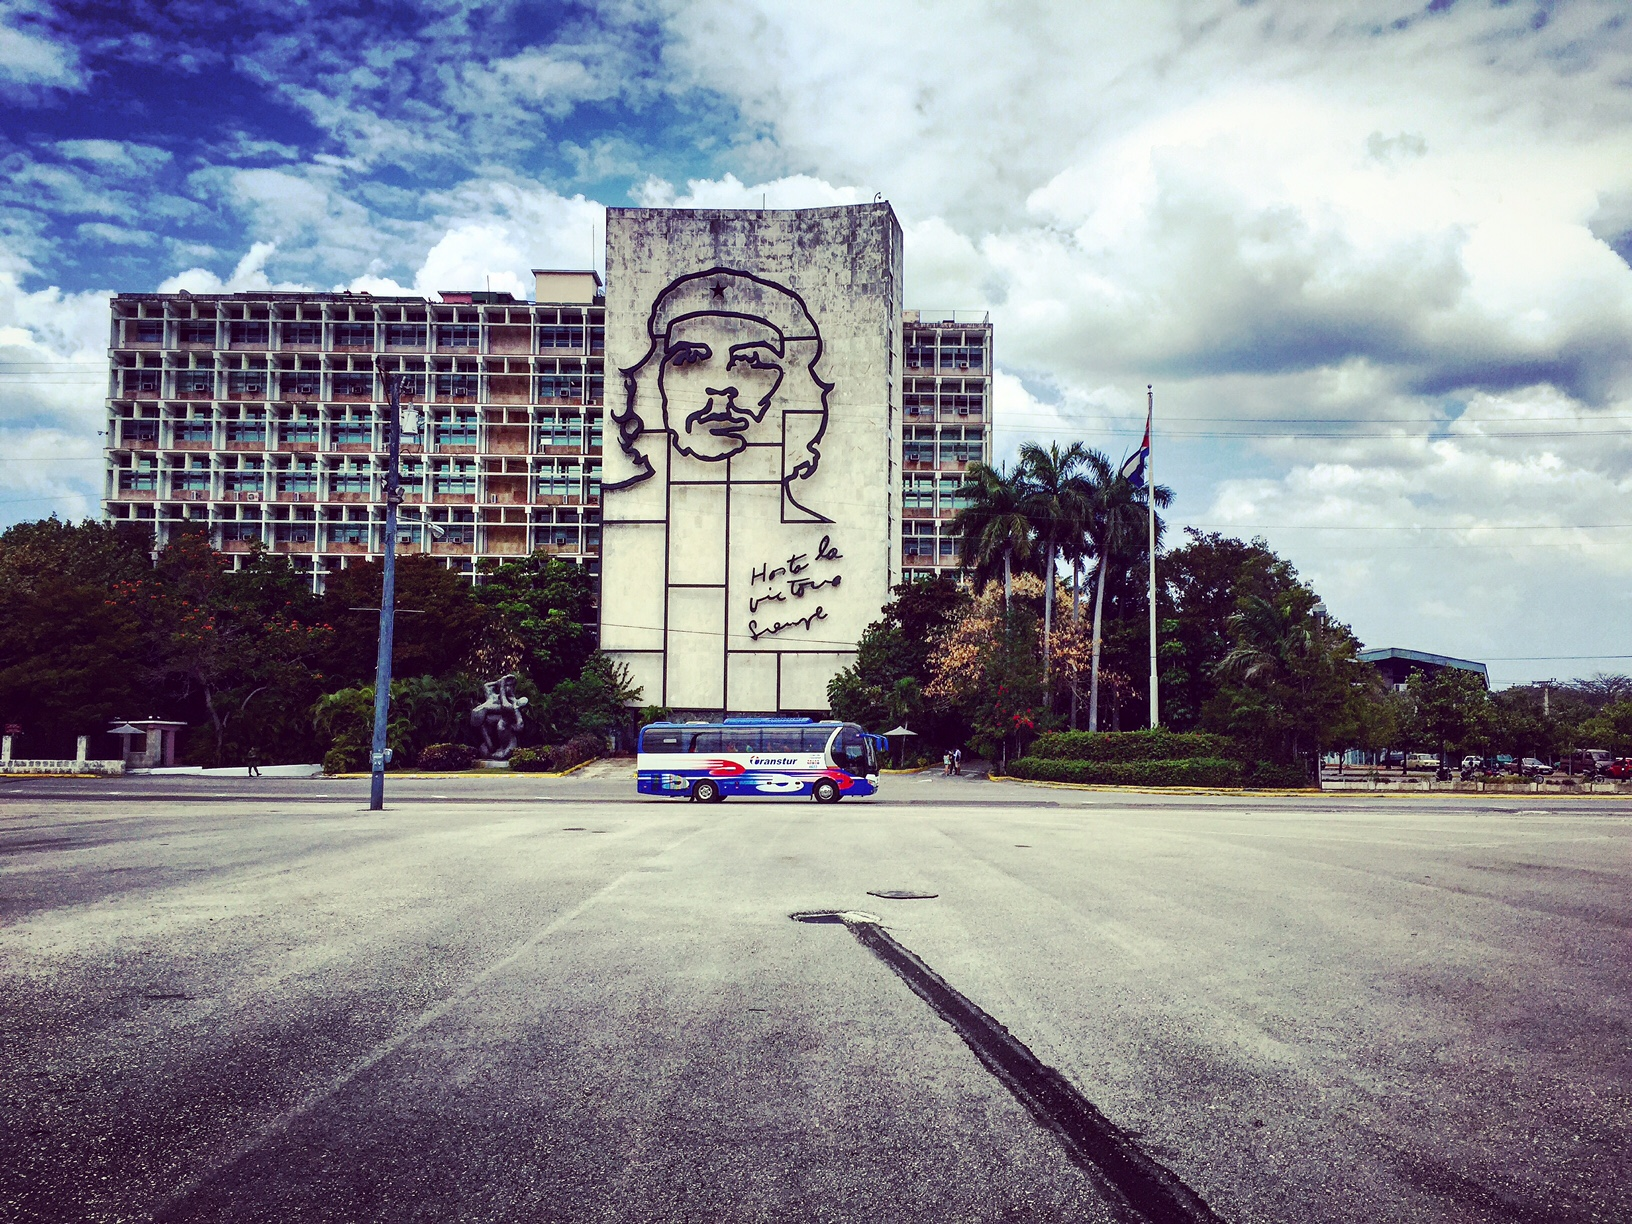 Plaza de la Revoluzion La Havane La Habana Cuba Commandant Che Guevara portrait photo usofparis travel blog voyage amérique du nord